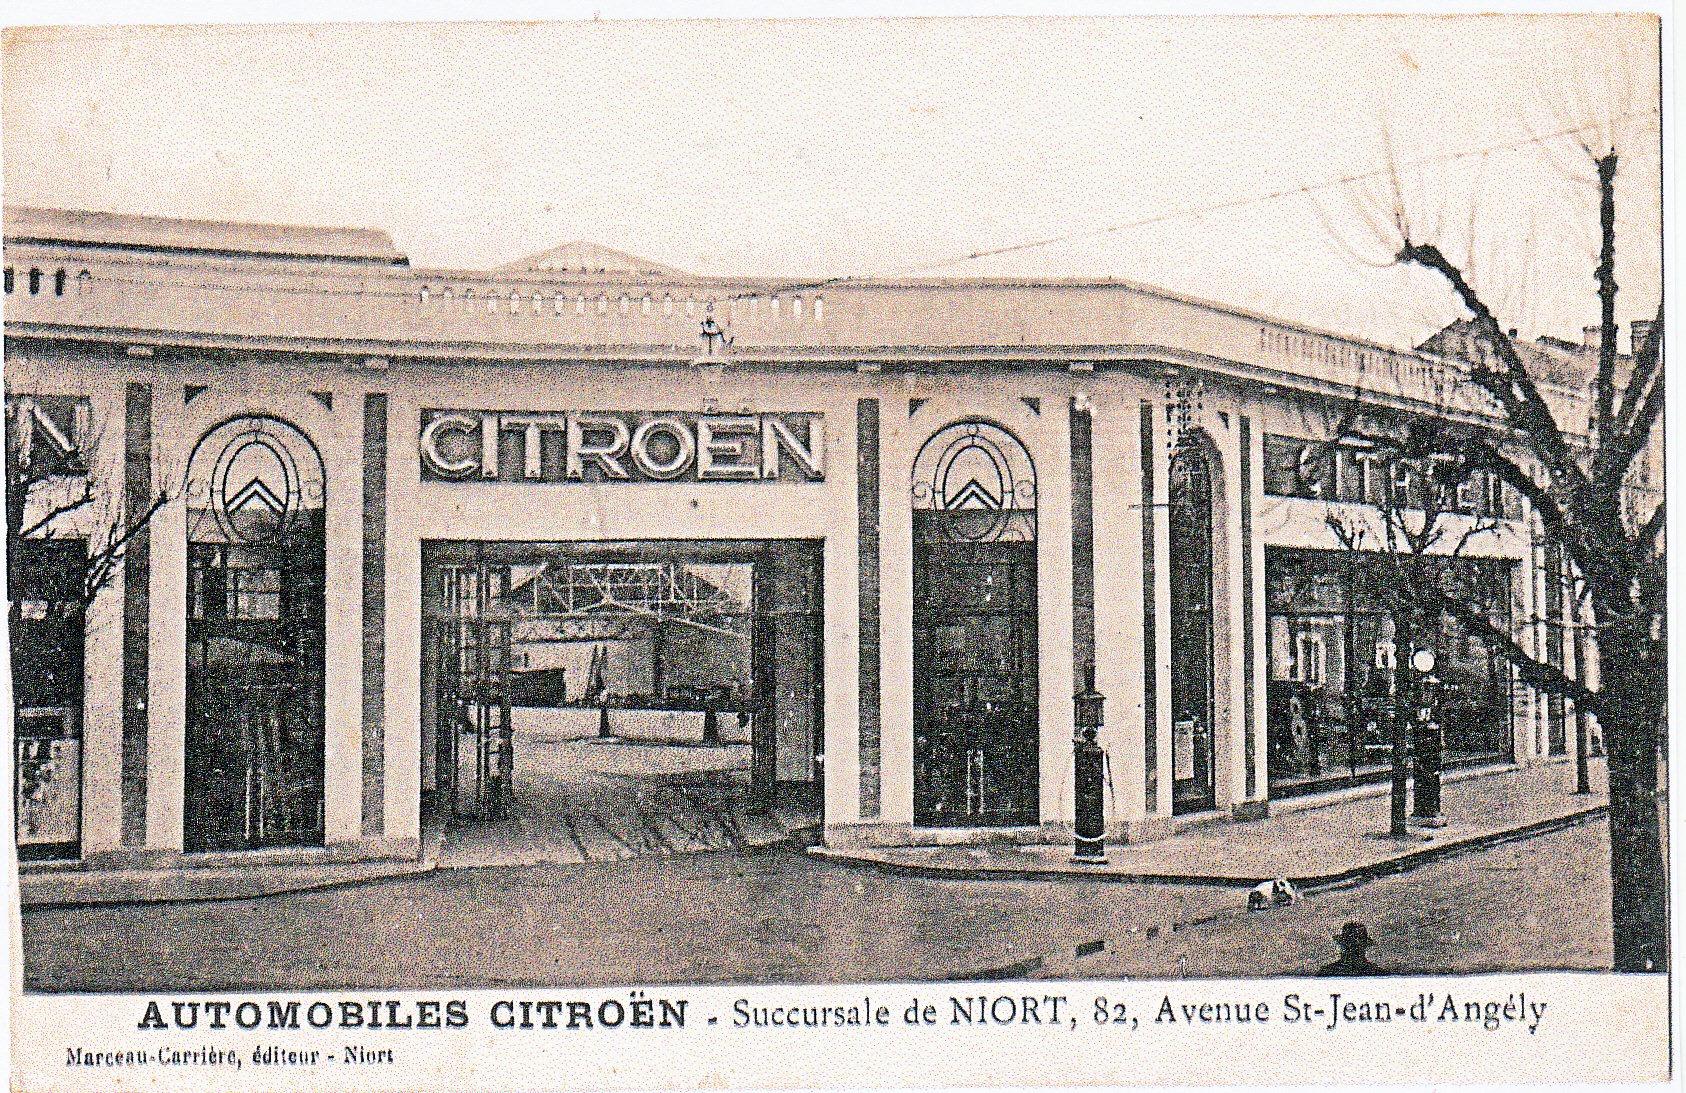 -Citroen-de-foire-SUCCURSALE-CITROEN-a-NIORT-79-1